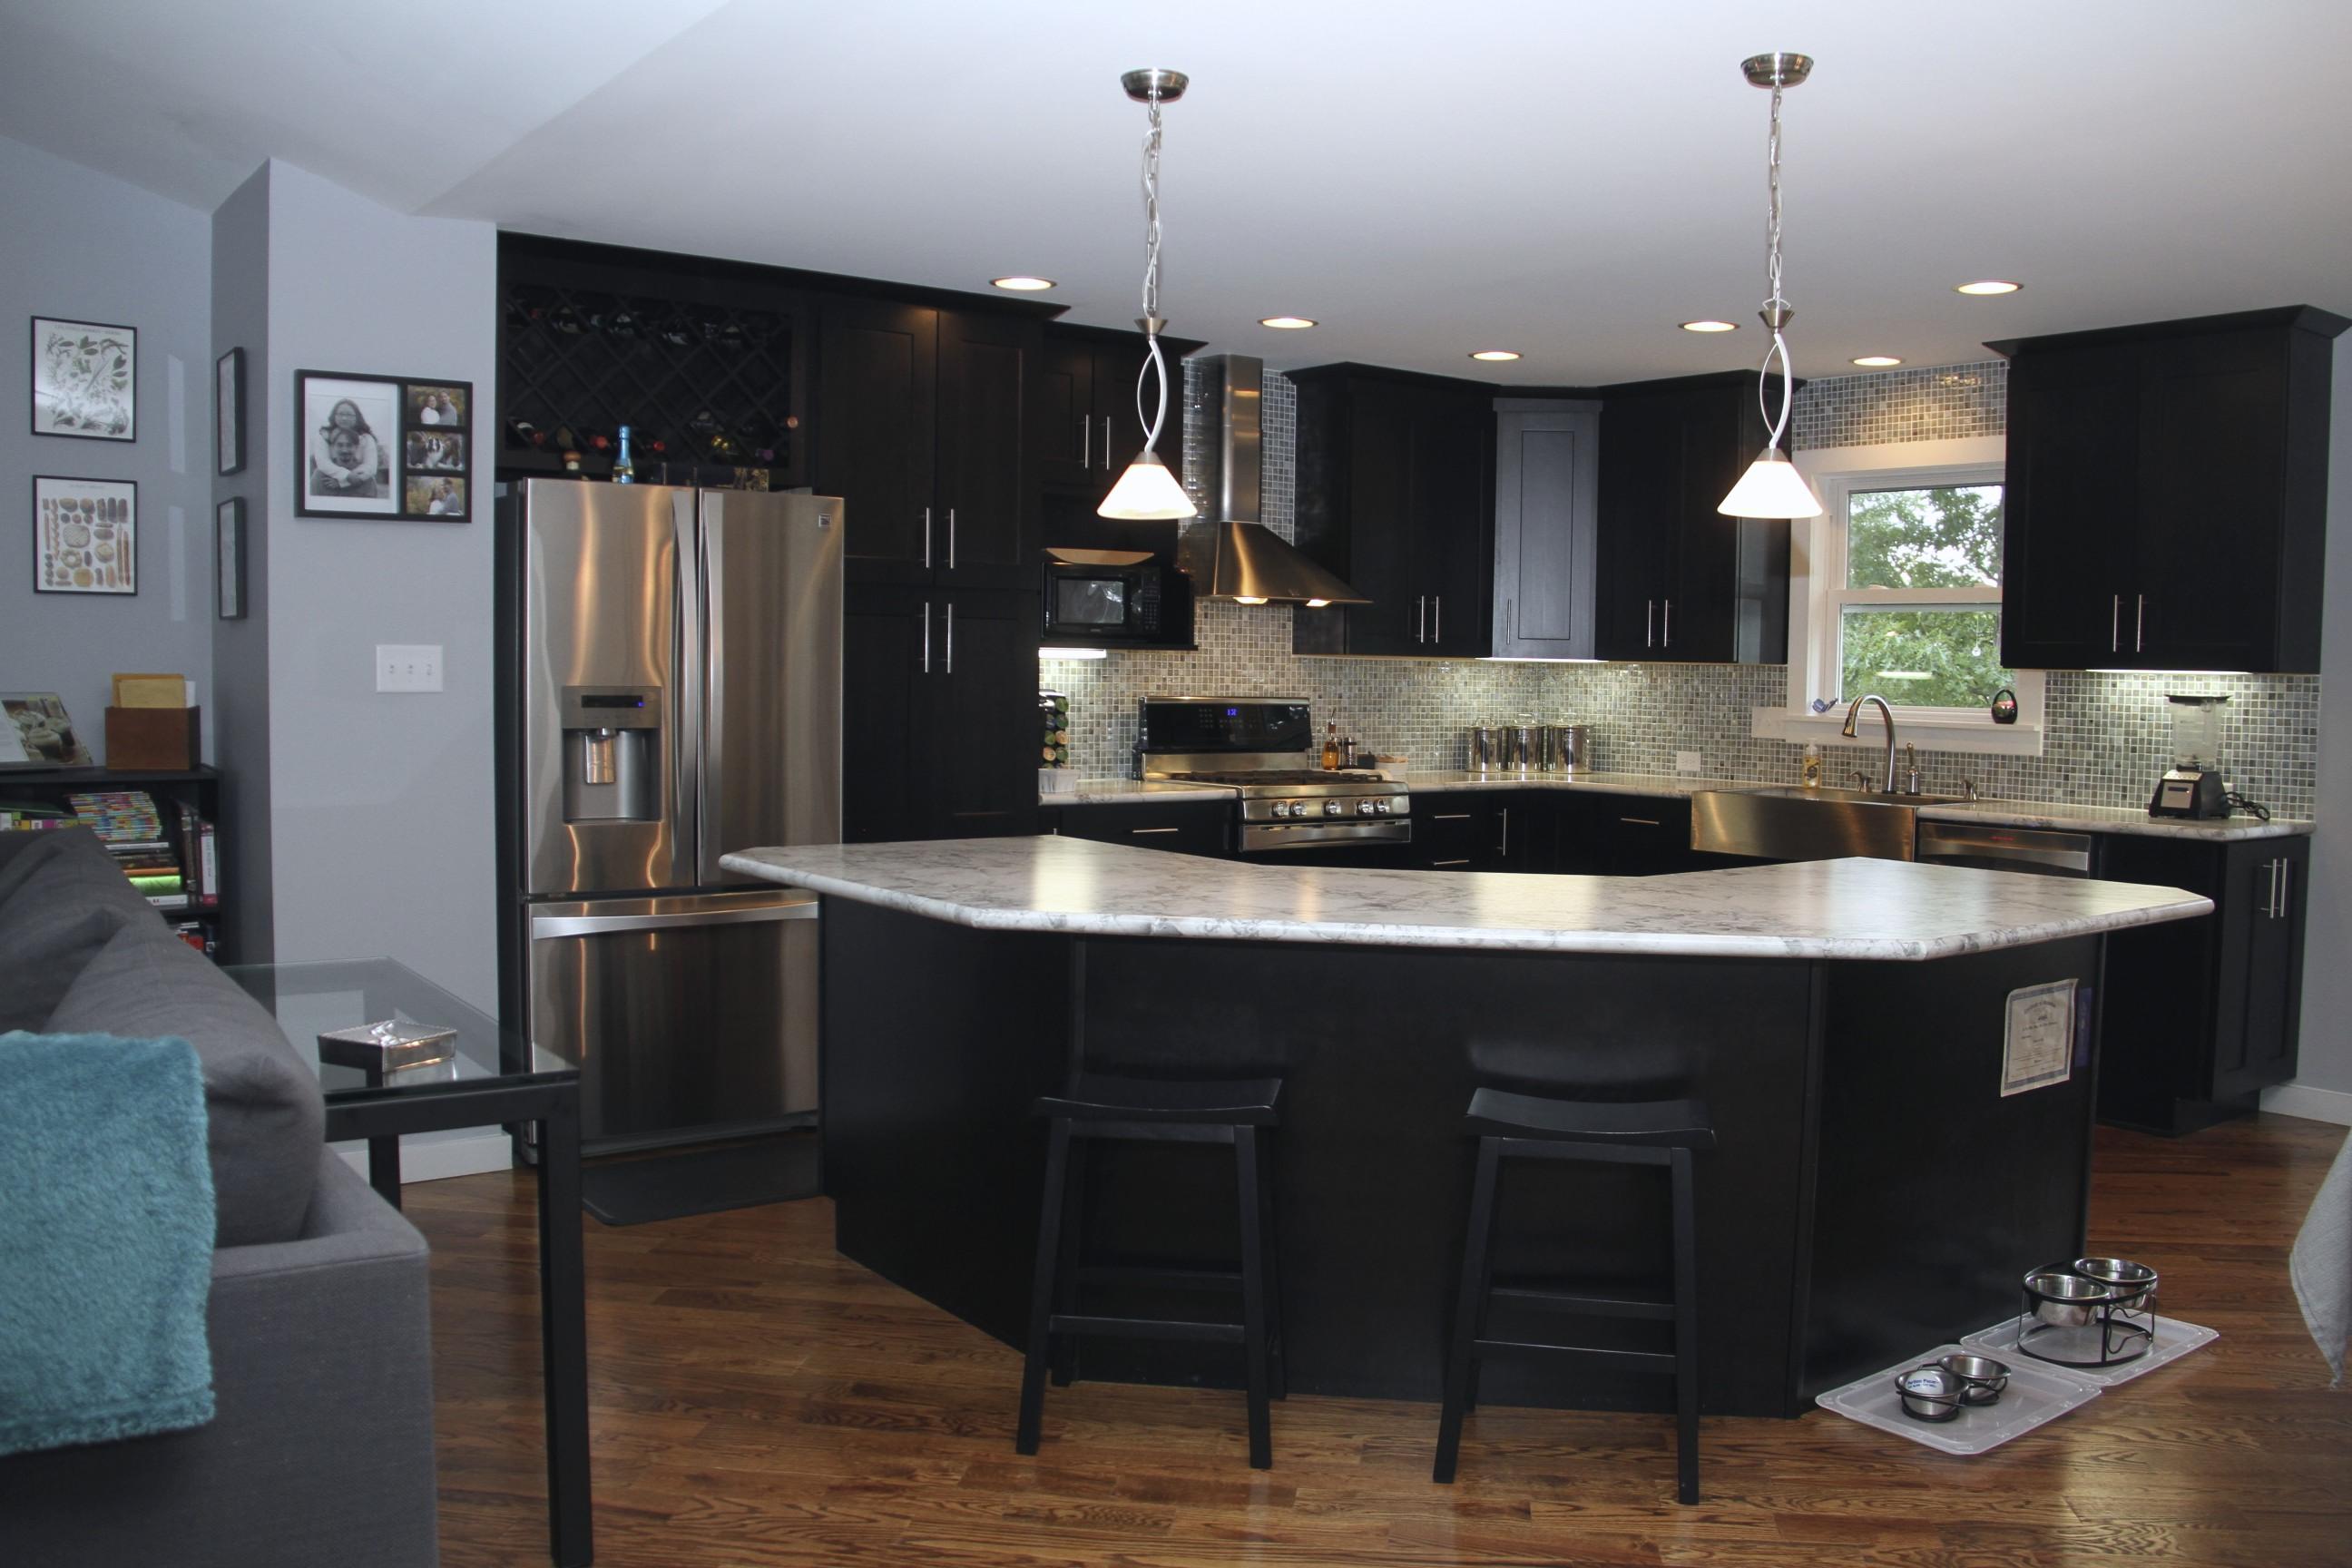 Kitchen Reveal!